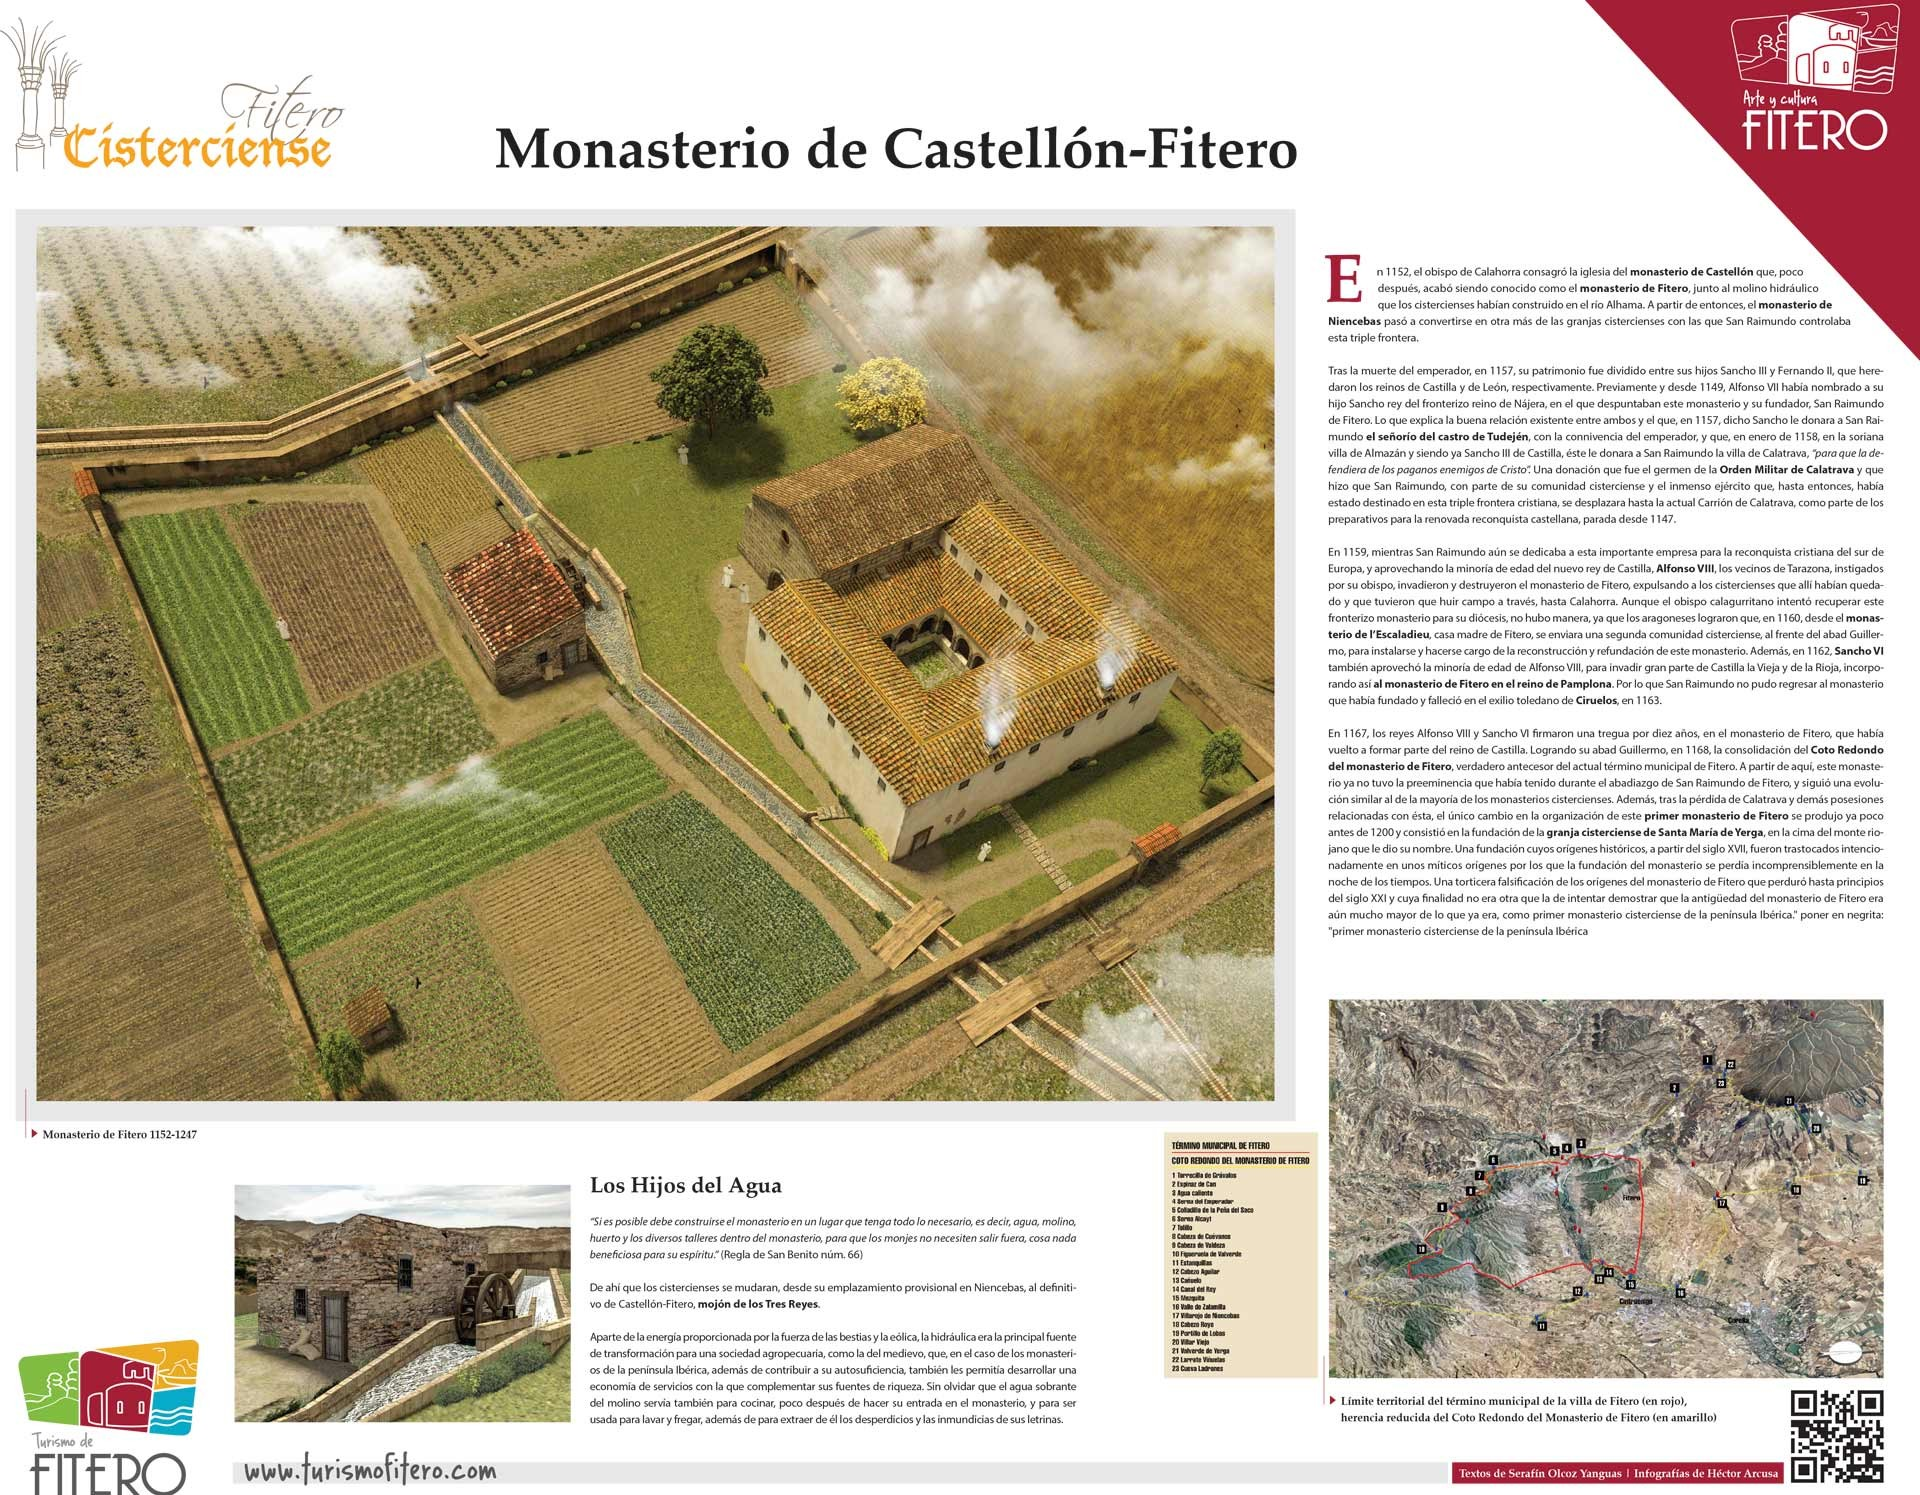 Monasterio de Castell³n Fitero